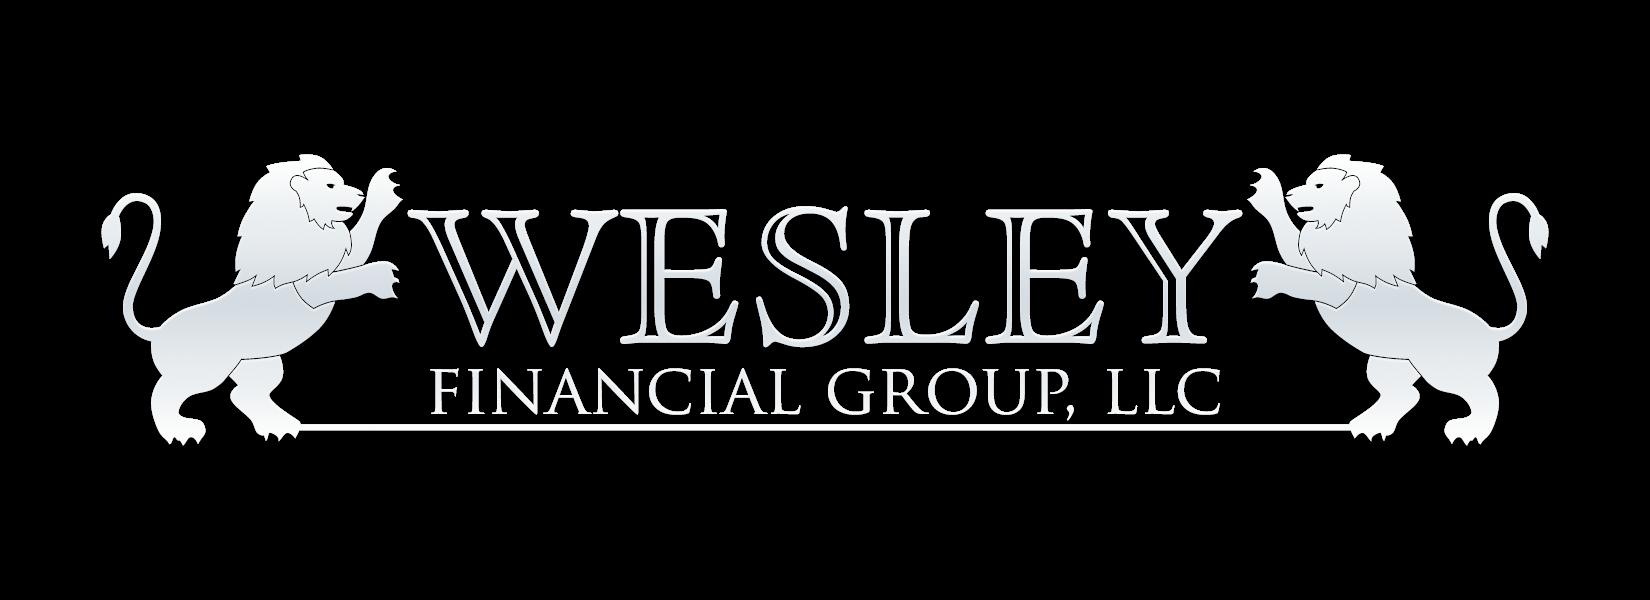 Wesley Financial Group, LLC